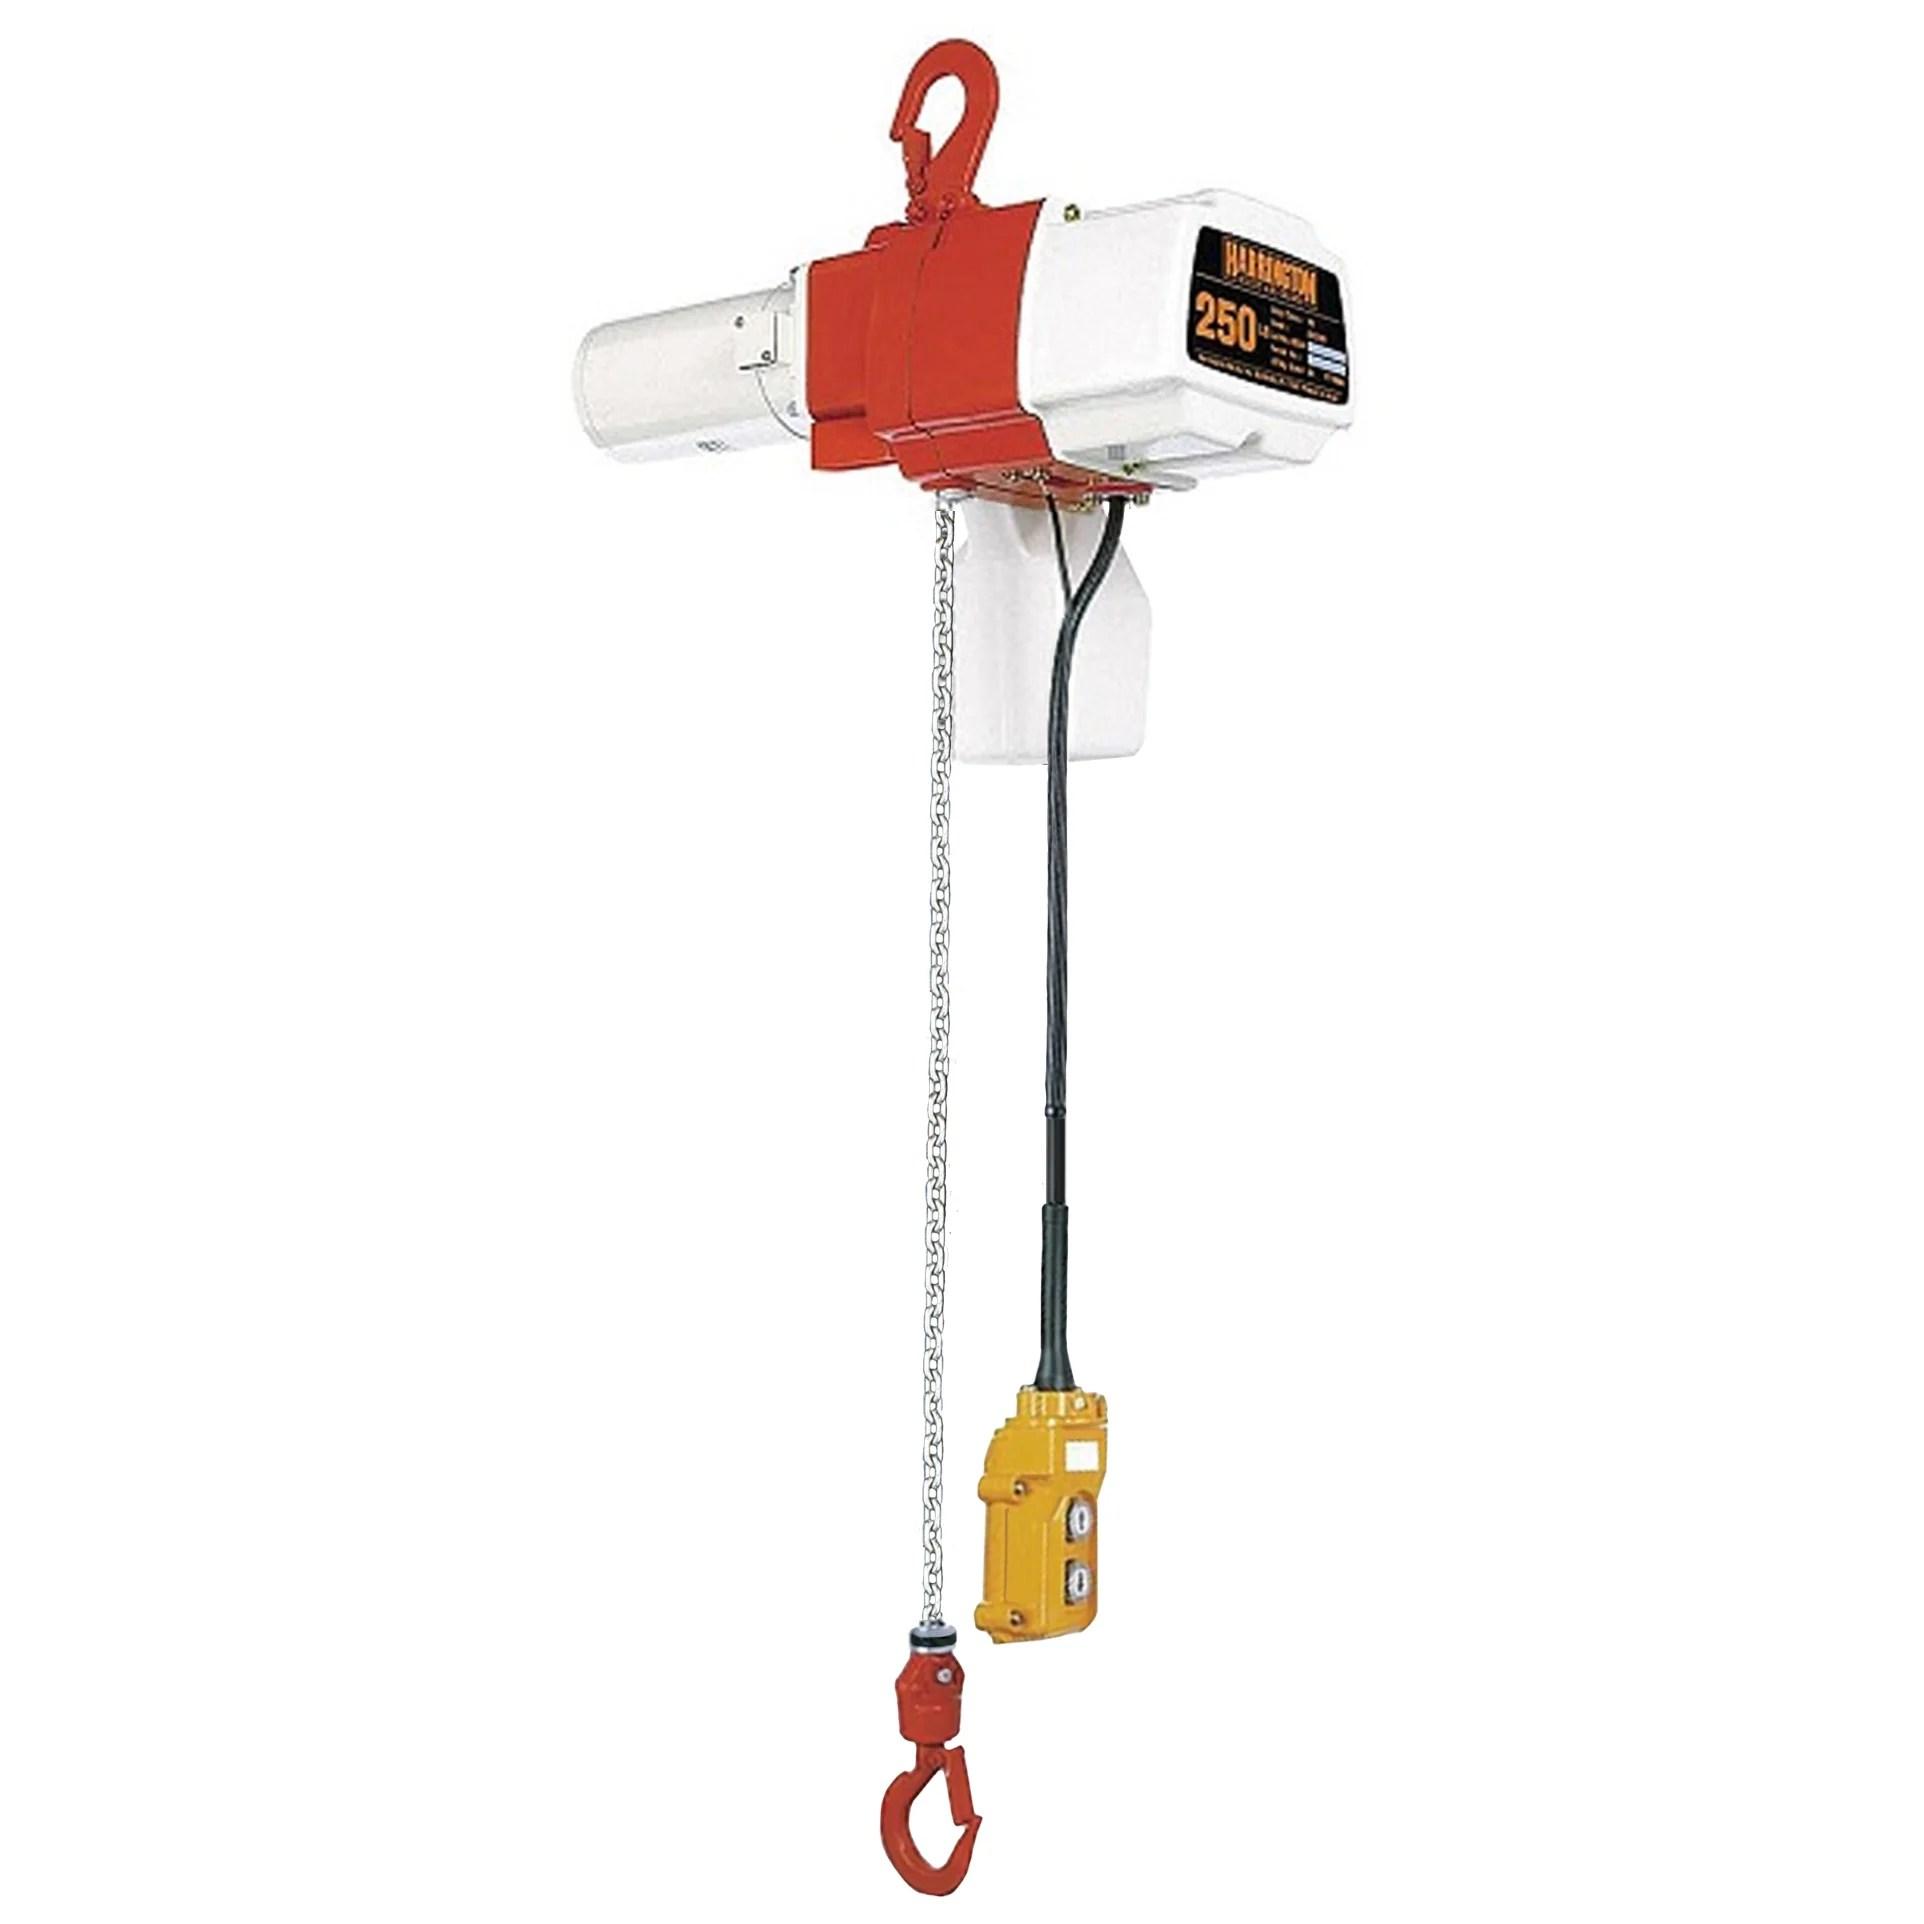 small resolution of 1 2 ton harrington ed series adjustable single speed single phase cranedepot